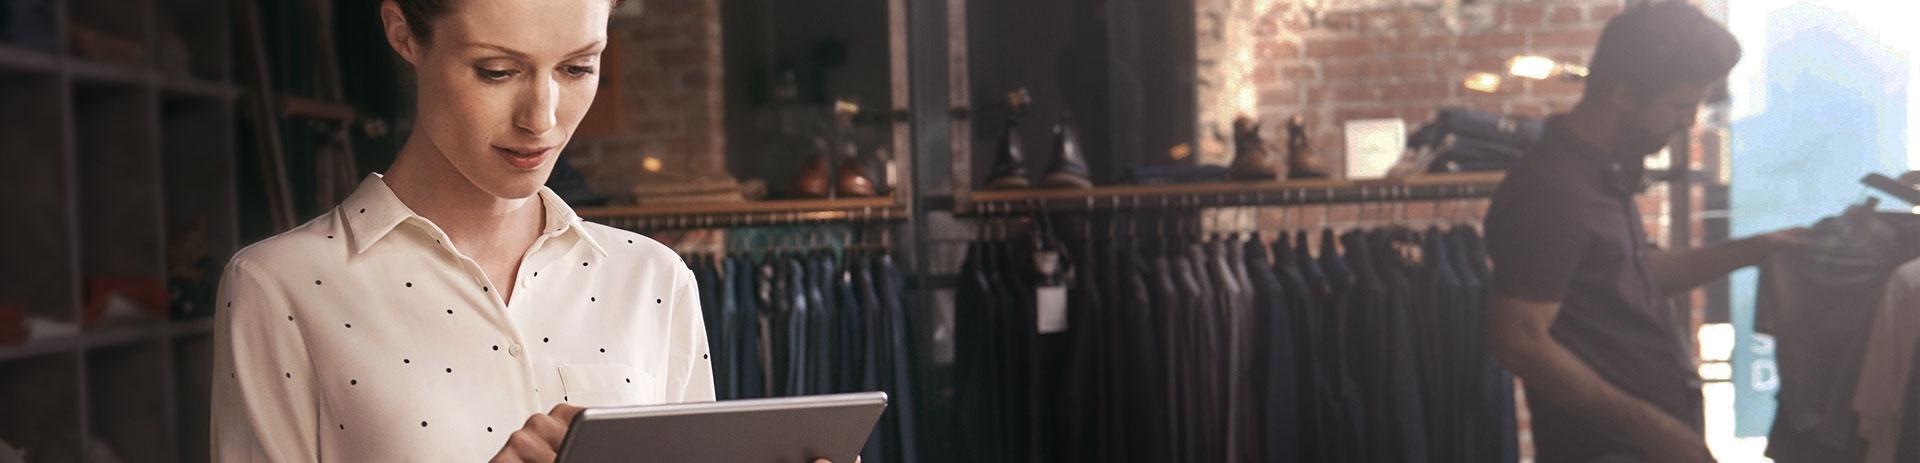 Verkäuferin in Gewandshop bedient Tablet